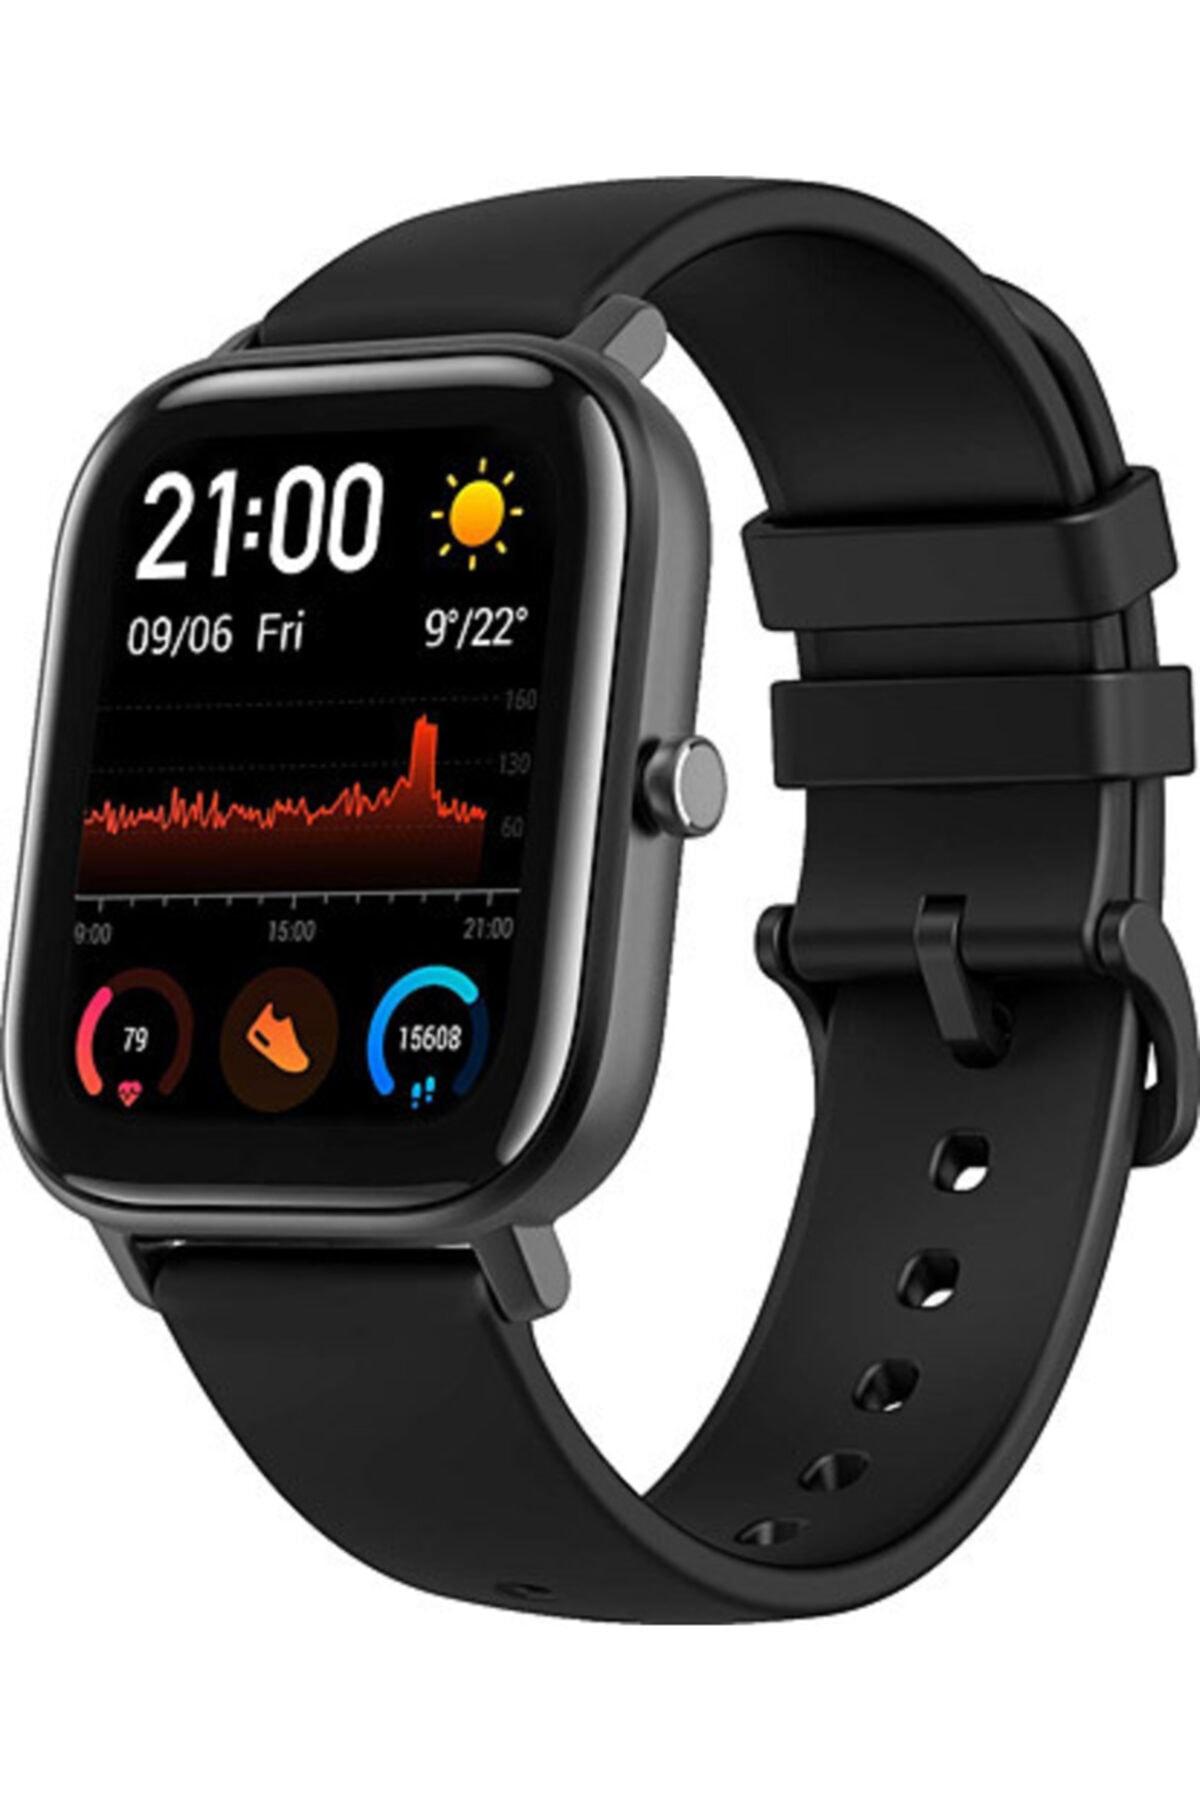 GWATCH P8 Tam Dokunmatik Akıllı Telefon Saat Bileklik Smart Watch 1